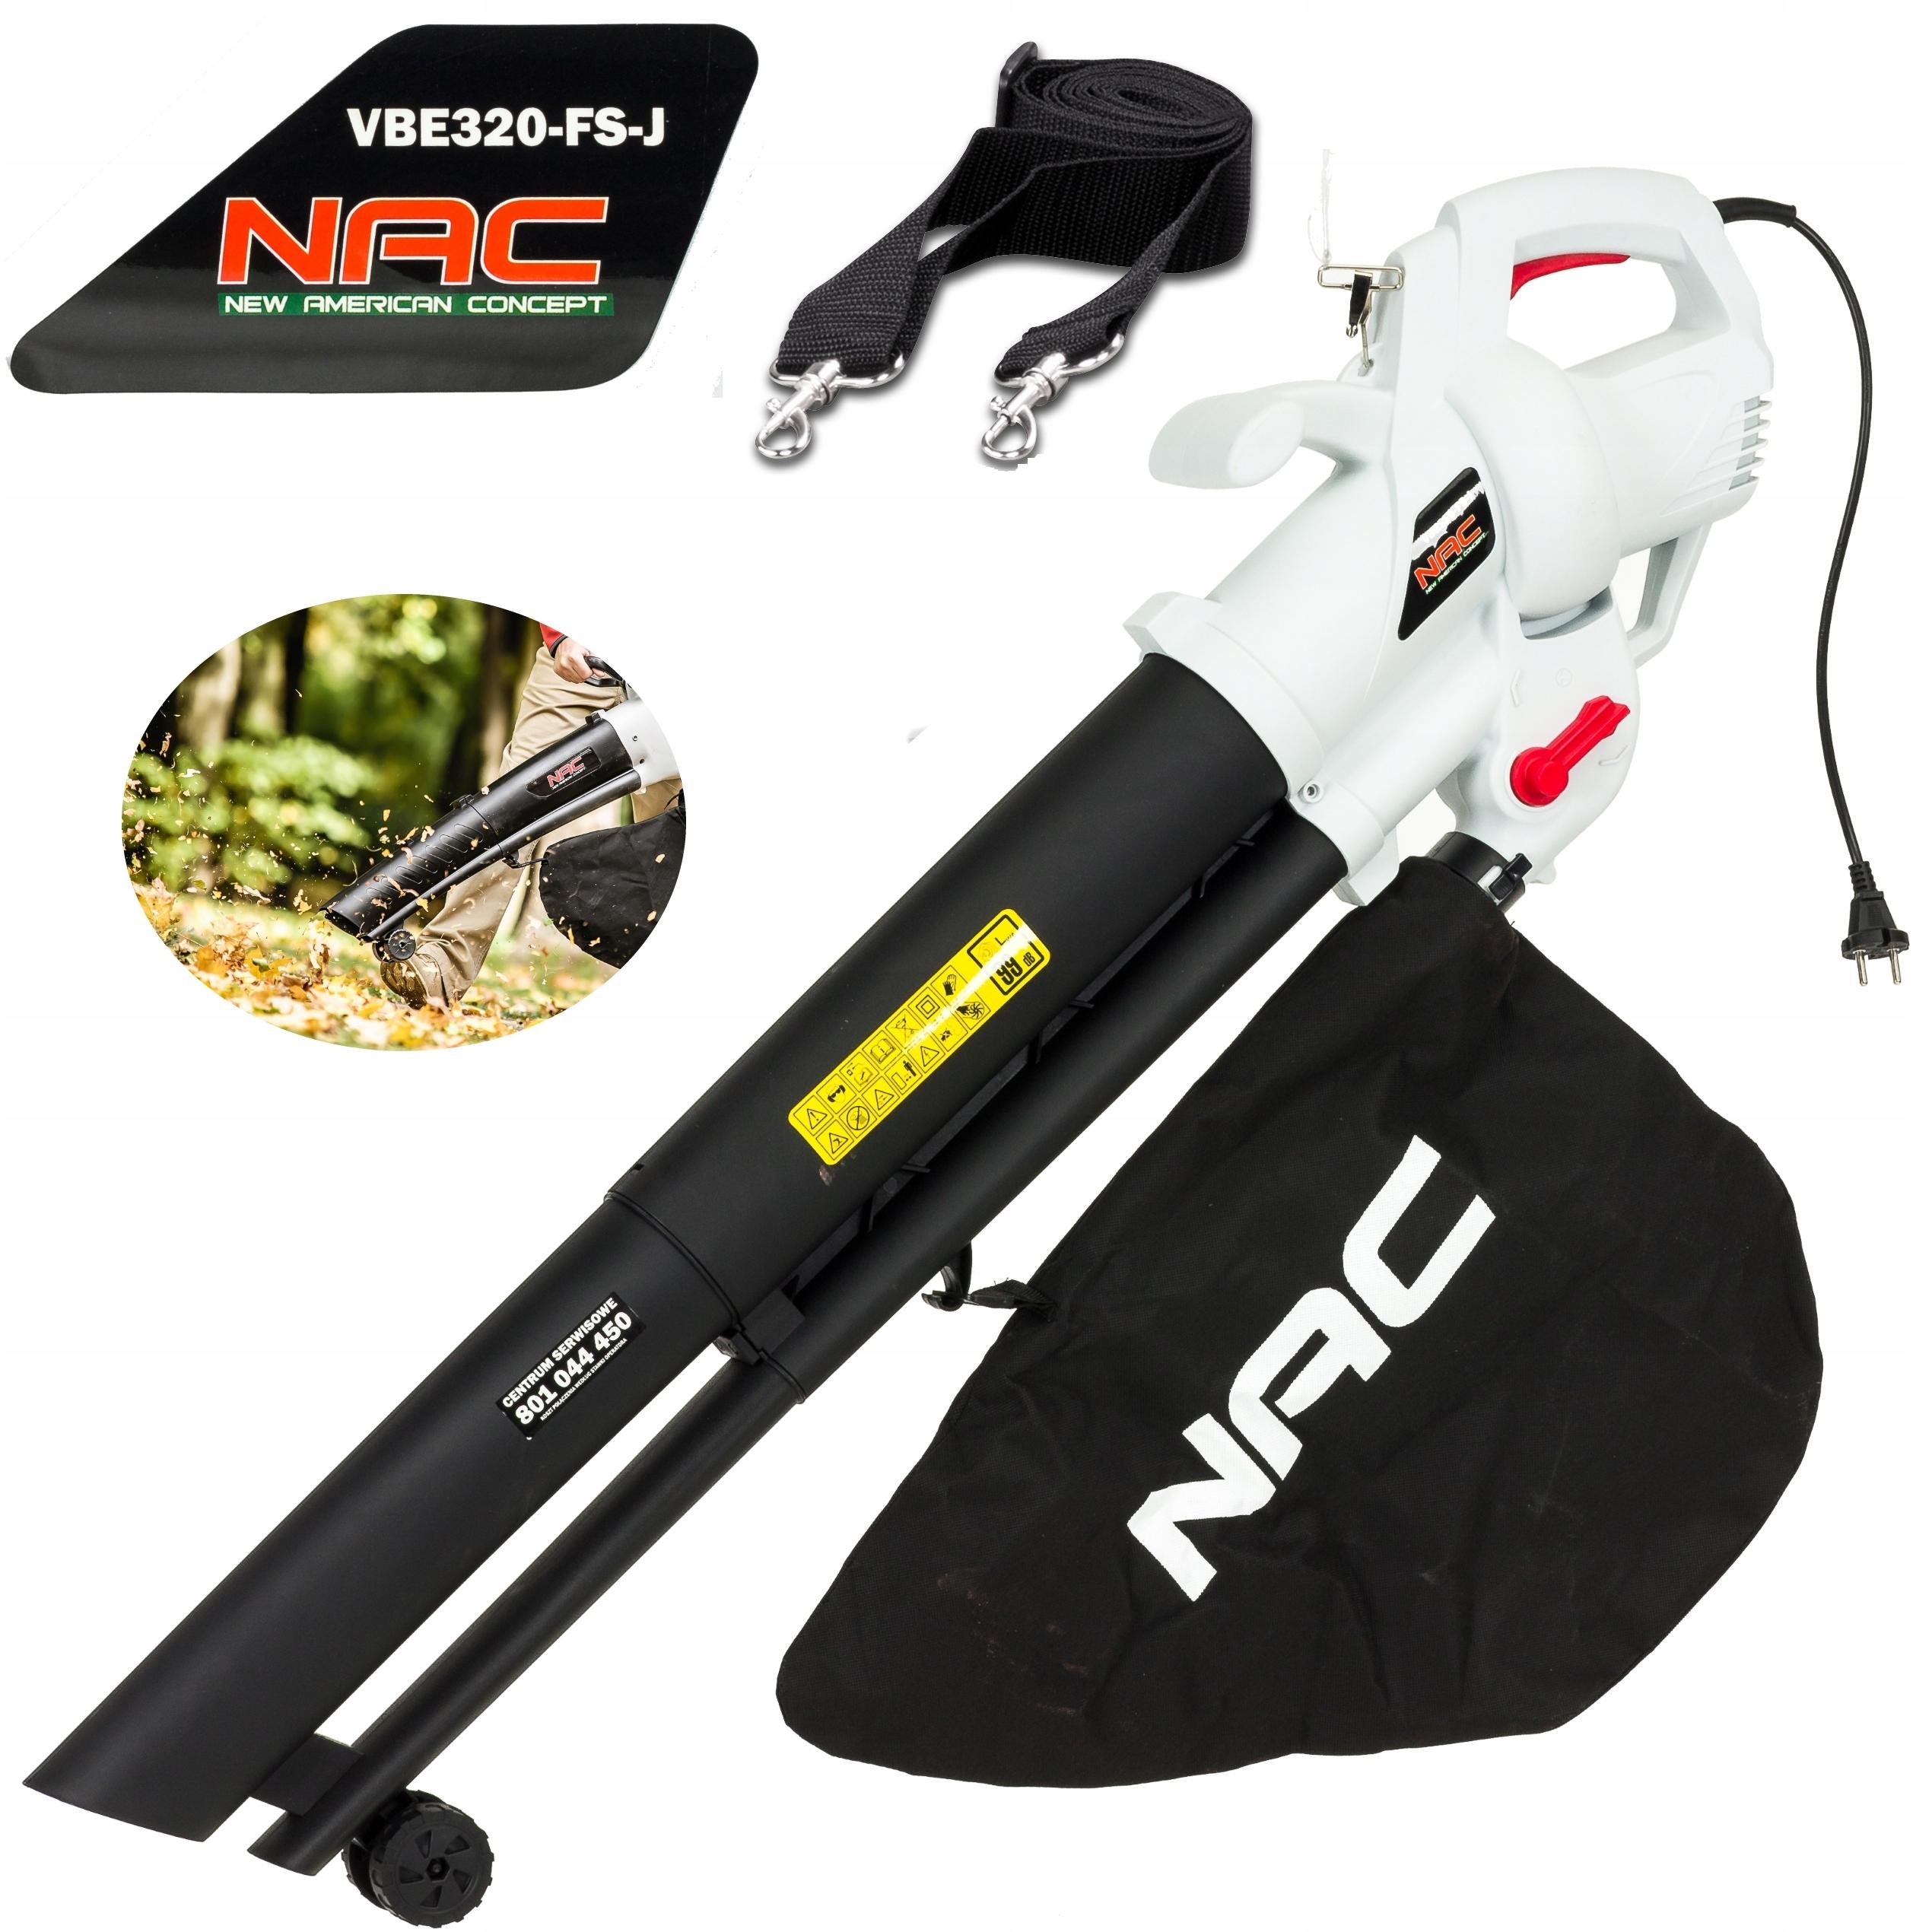 NAC Garden Vacuum Cleaner Leaf Blower 3200 Вт